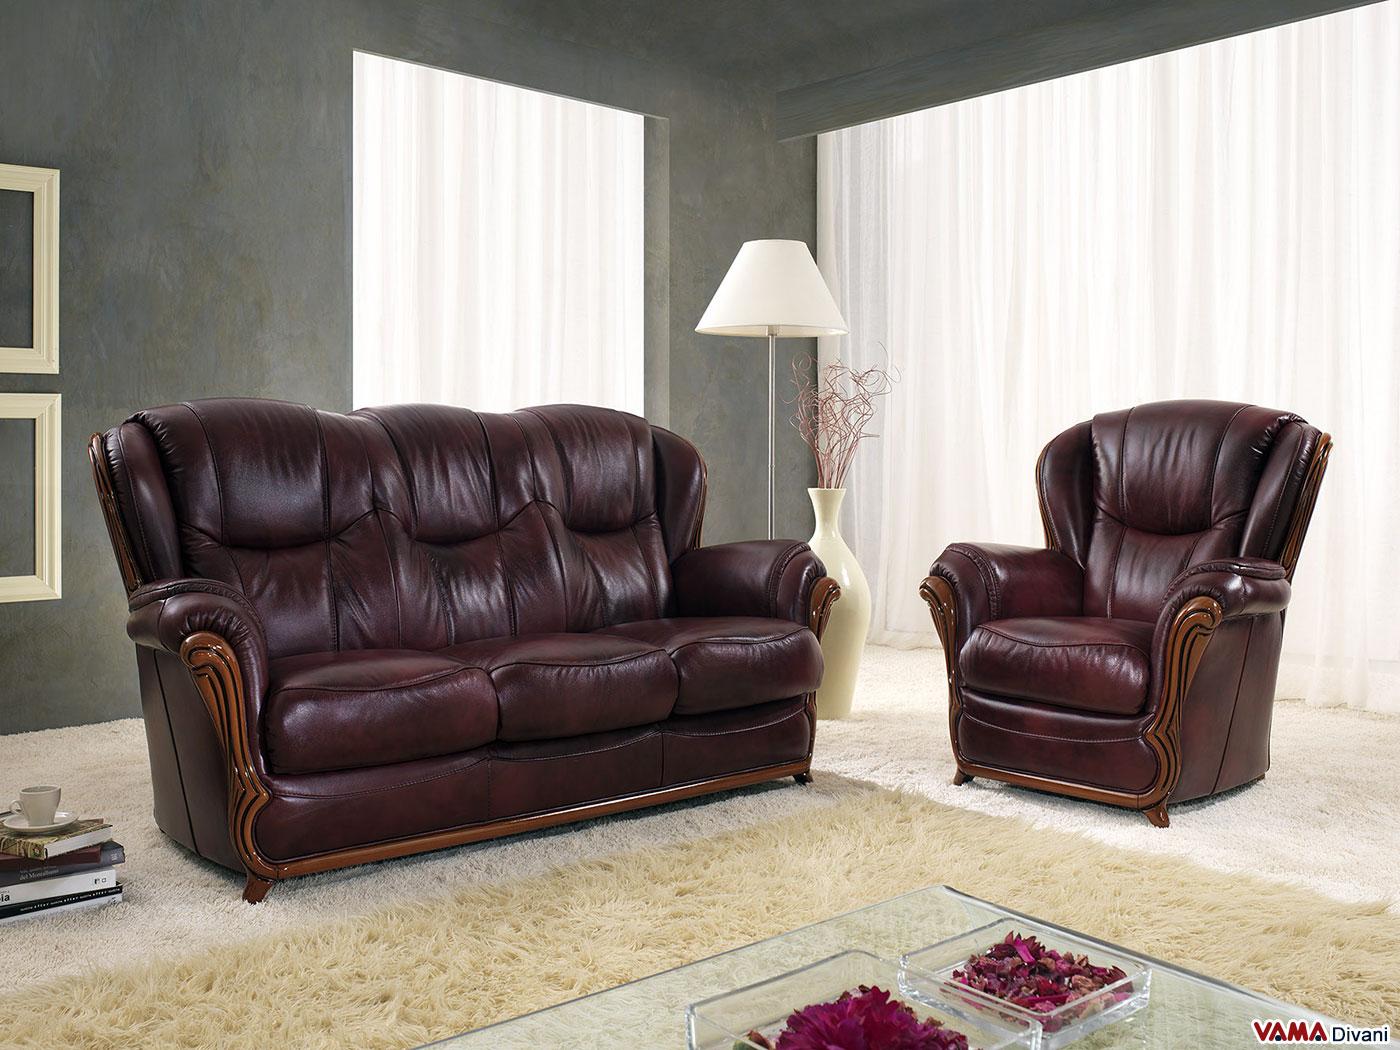 Vama divani blog un bellissimo divano classico in pelle - Divano classico in pelle ...